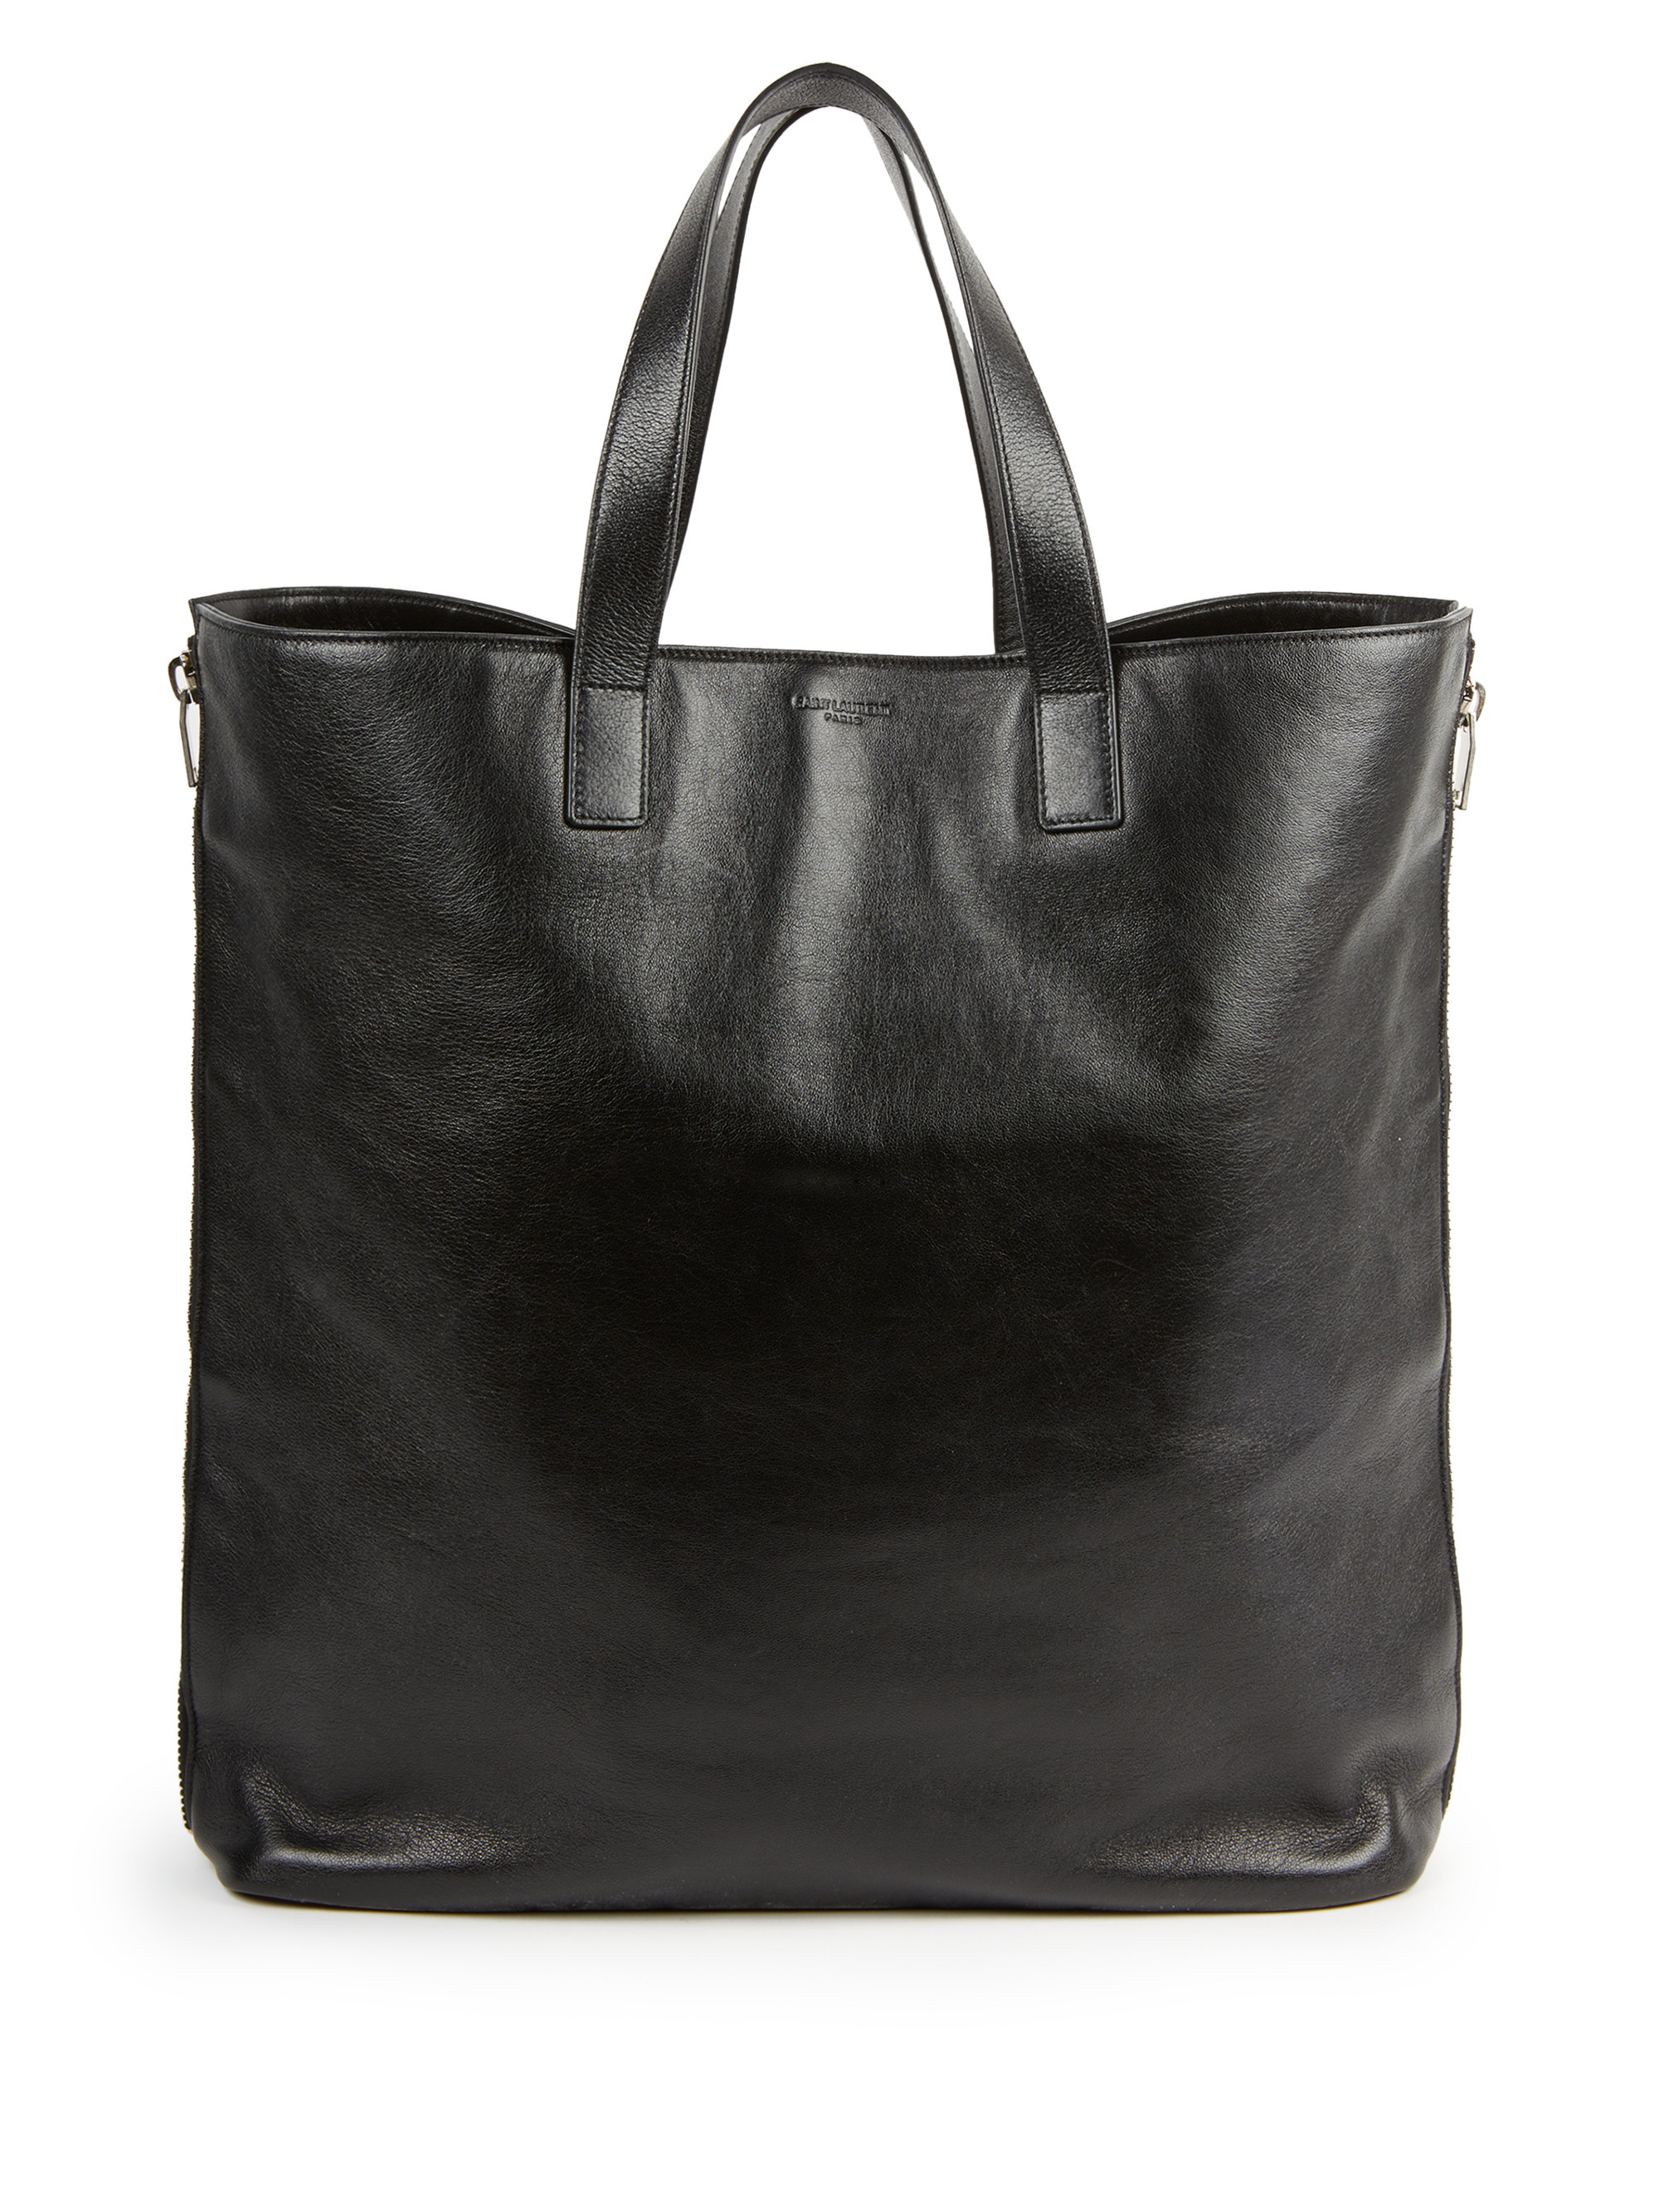 lyst saint laurent double zip shopper tote in black for men. Black Bedroom Furniture Sets. Home Design Ideas